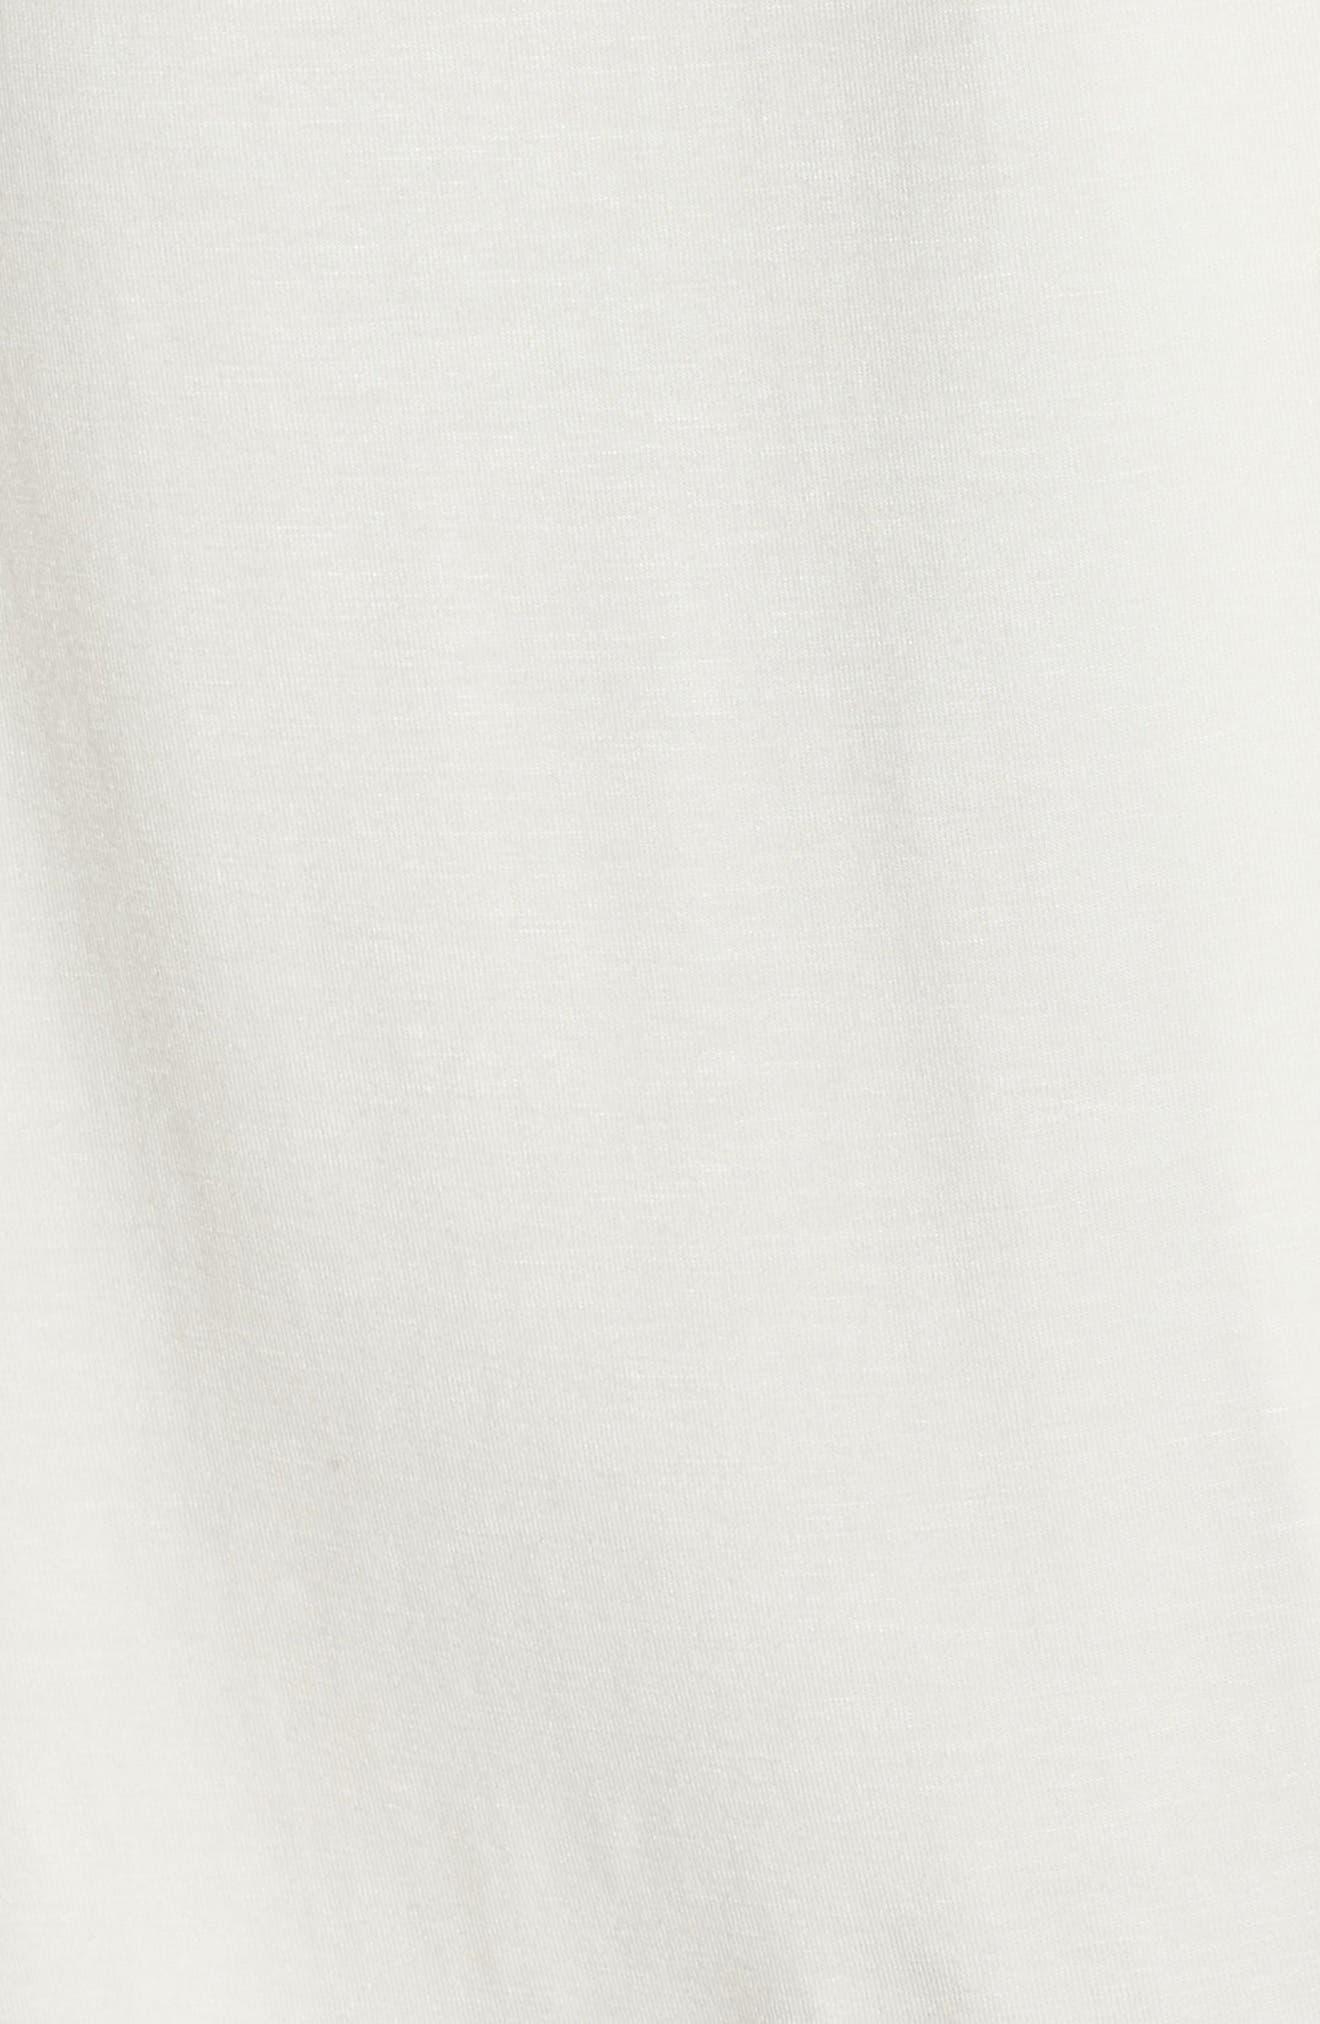 Serafina Kimono Robe,                             Alternate thumbnail 5, color,